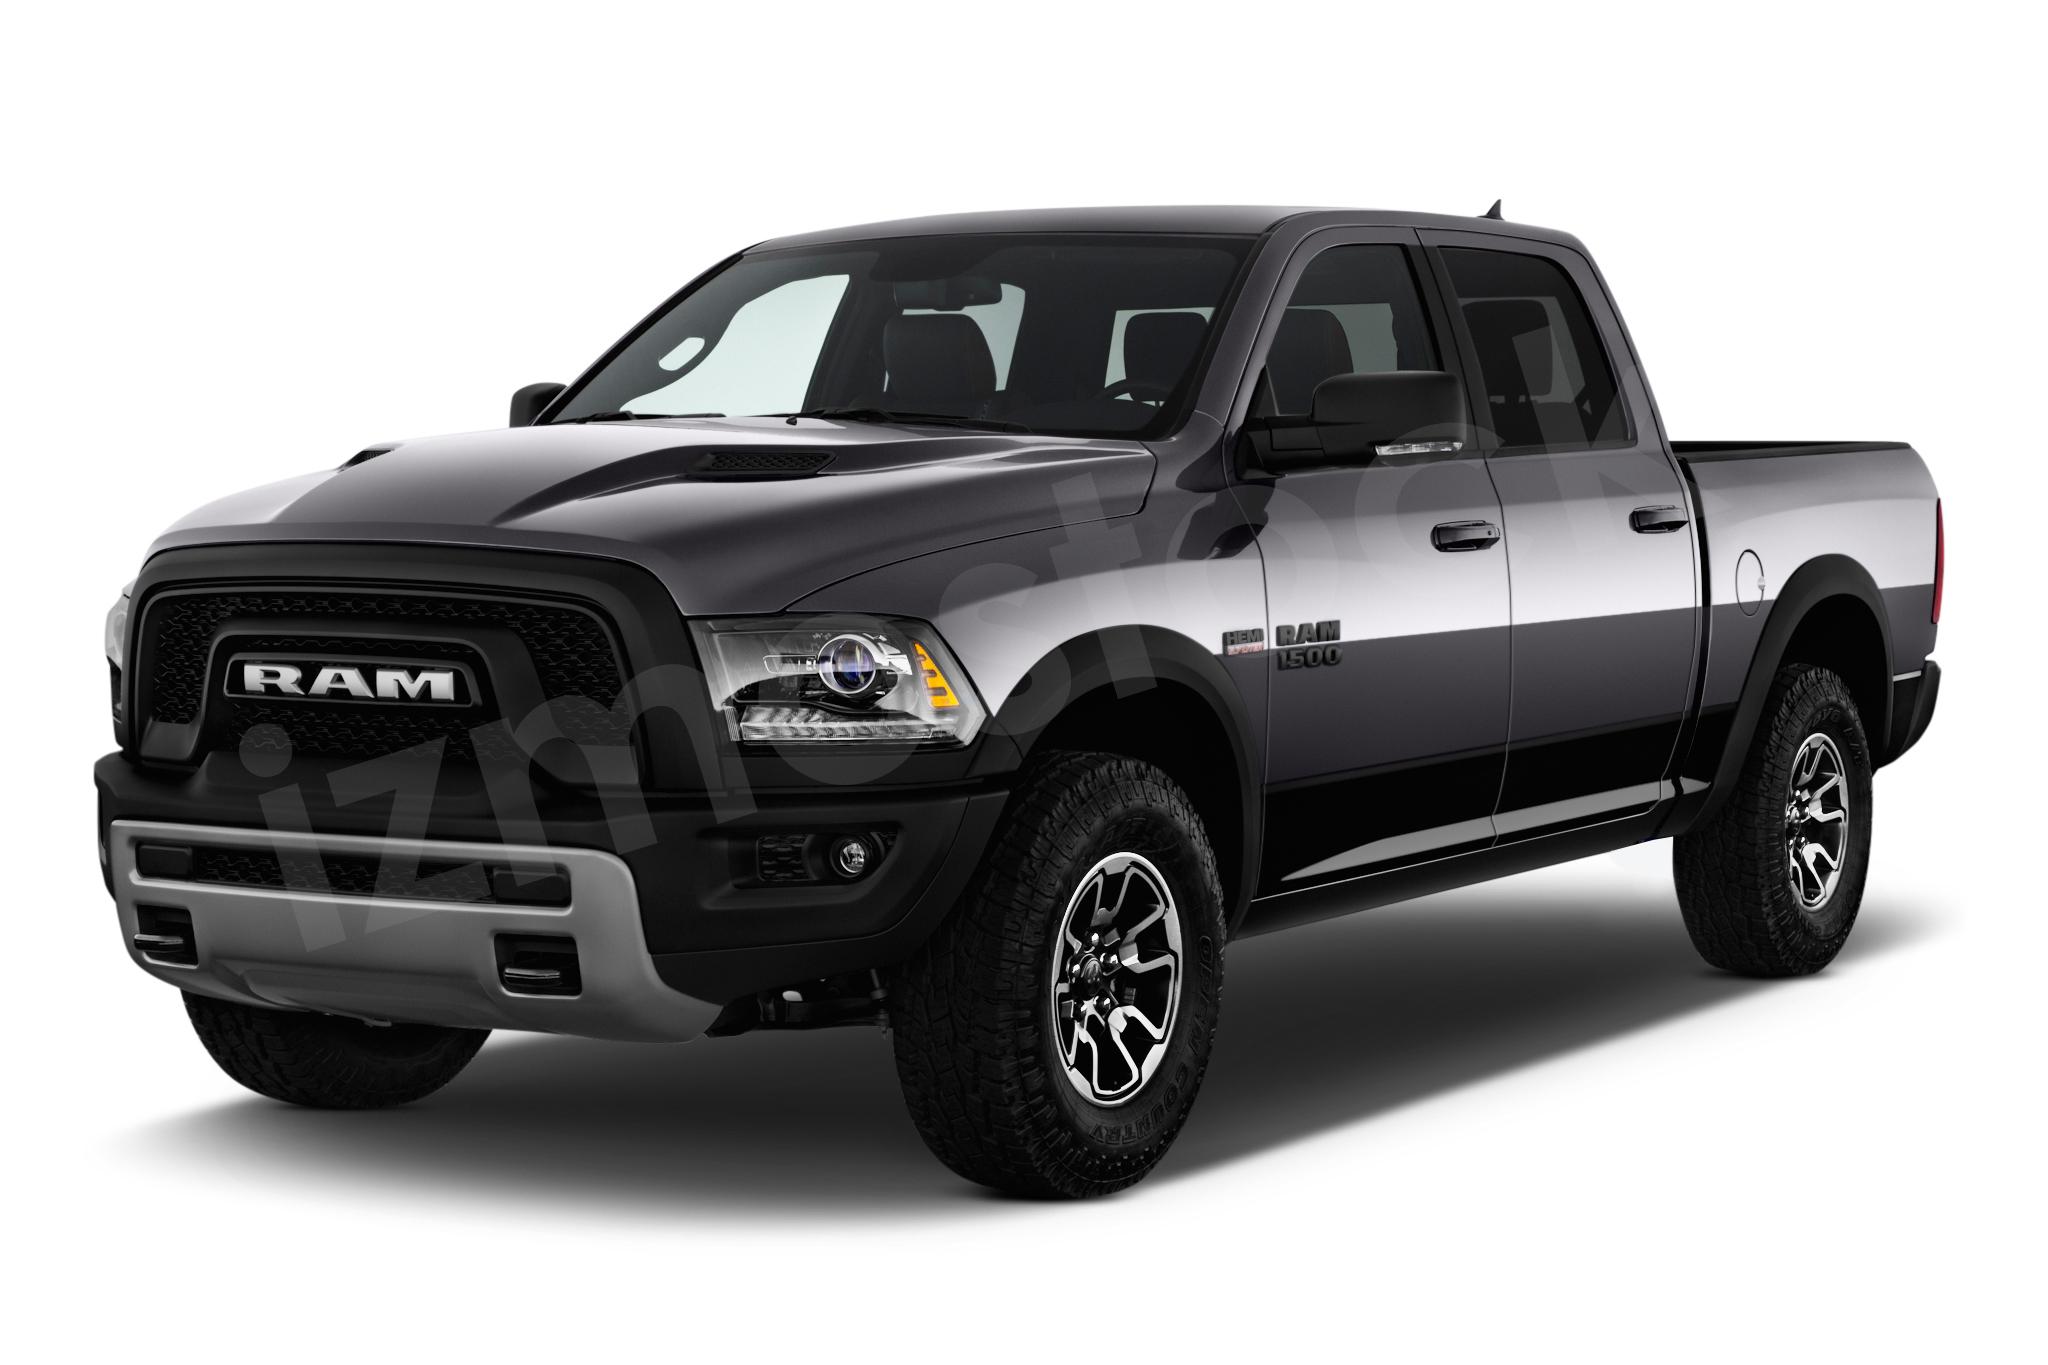 Do-It-All Truck: 2017 RAM 1500 Rebel Review